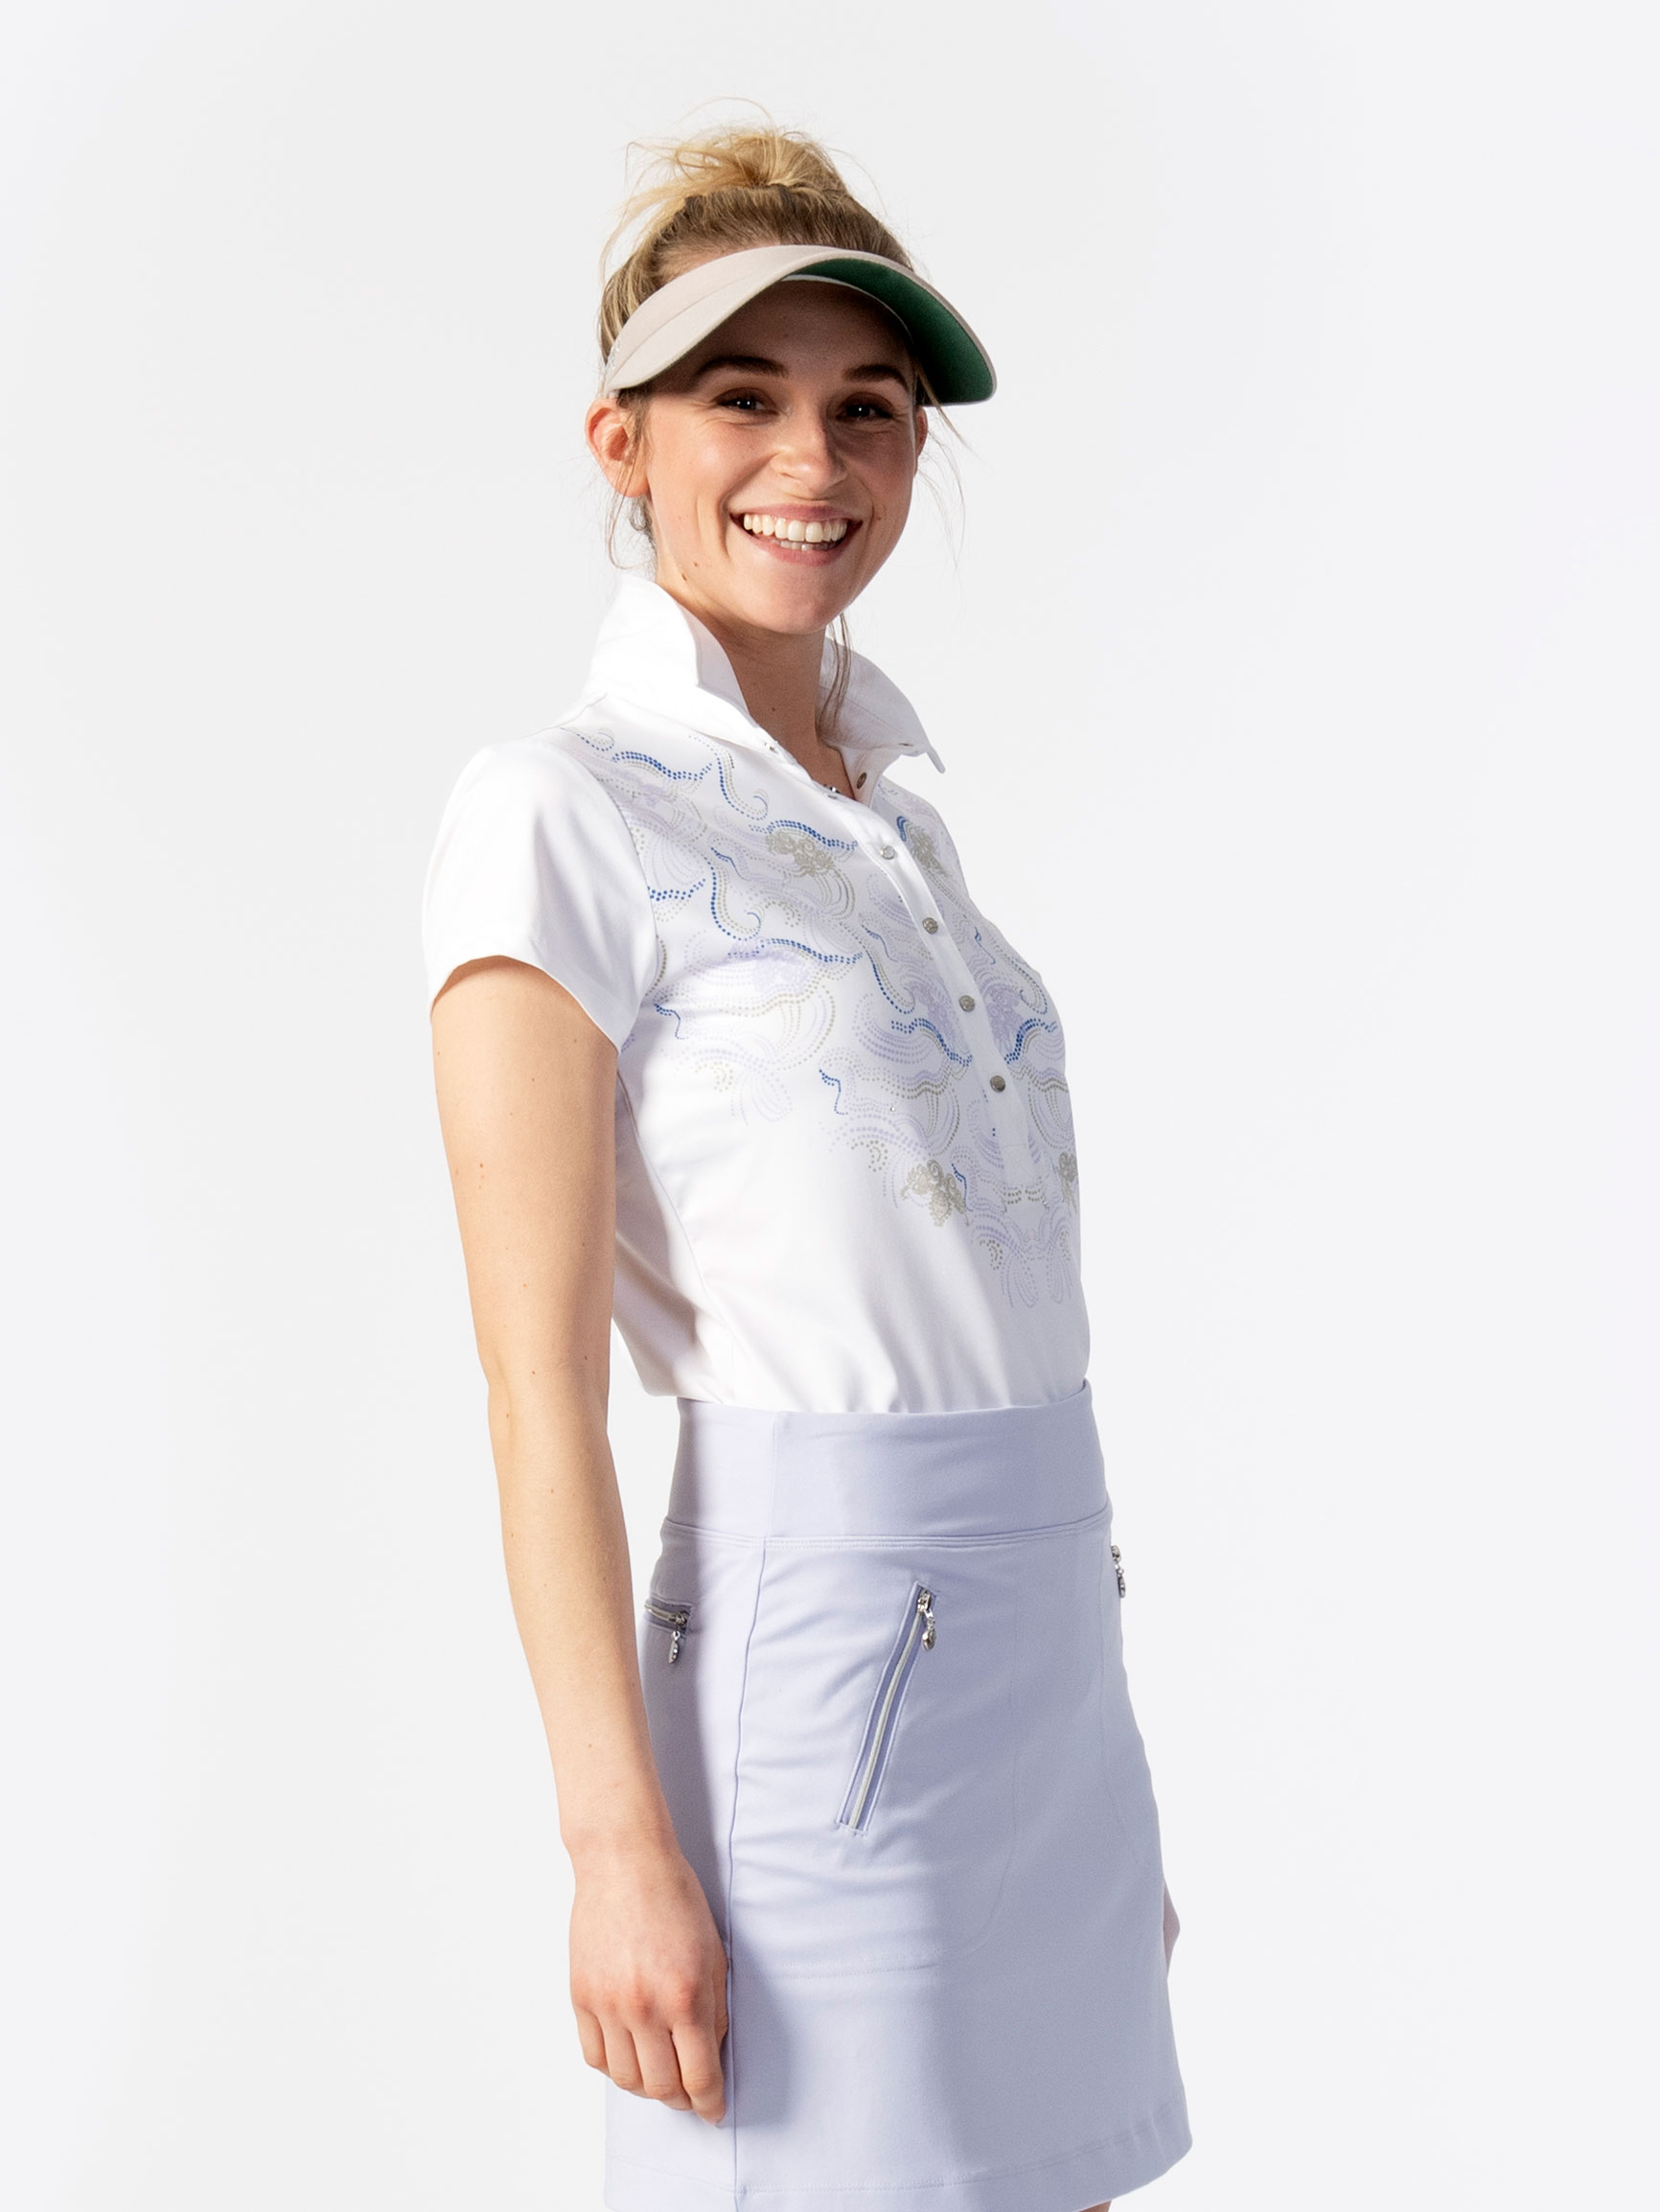 Viola Cap Short-sleeved Polo Shirt